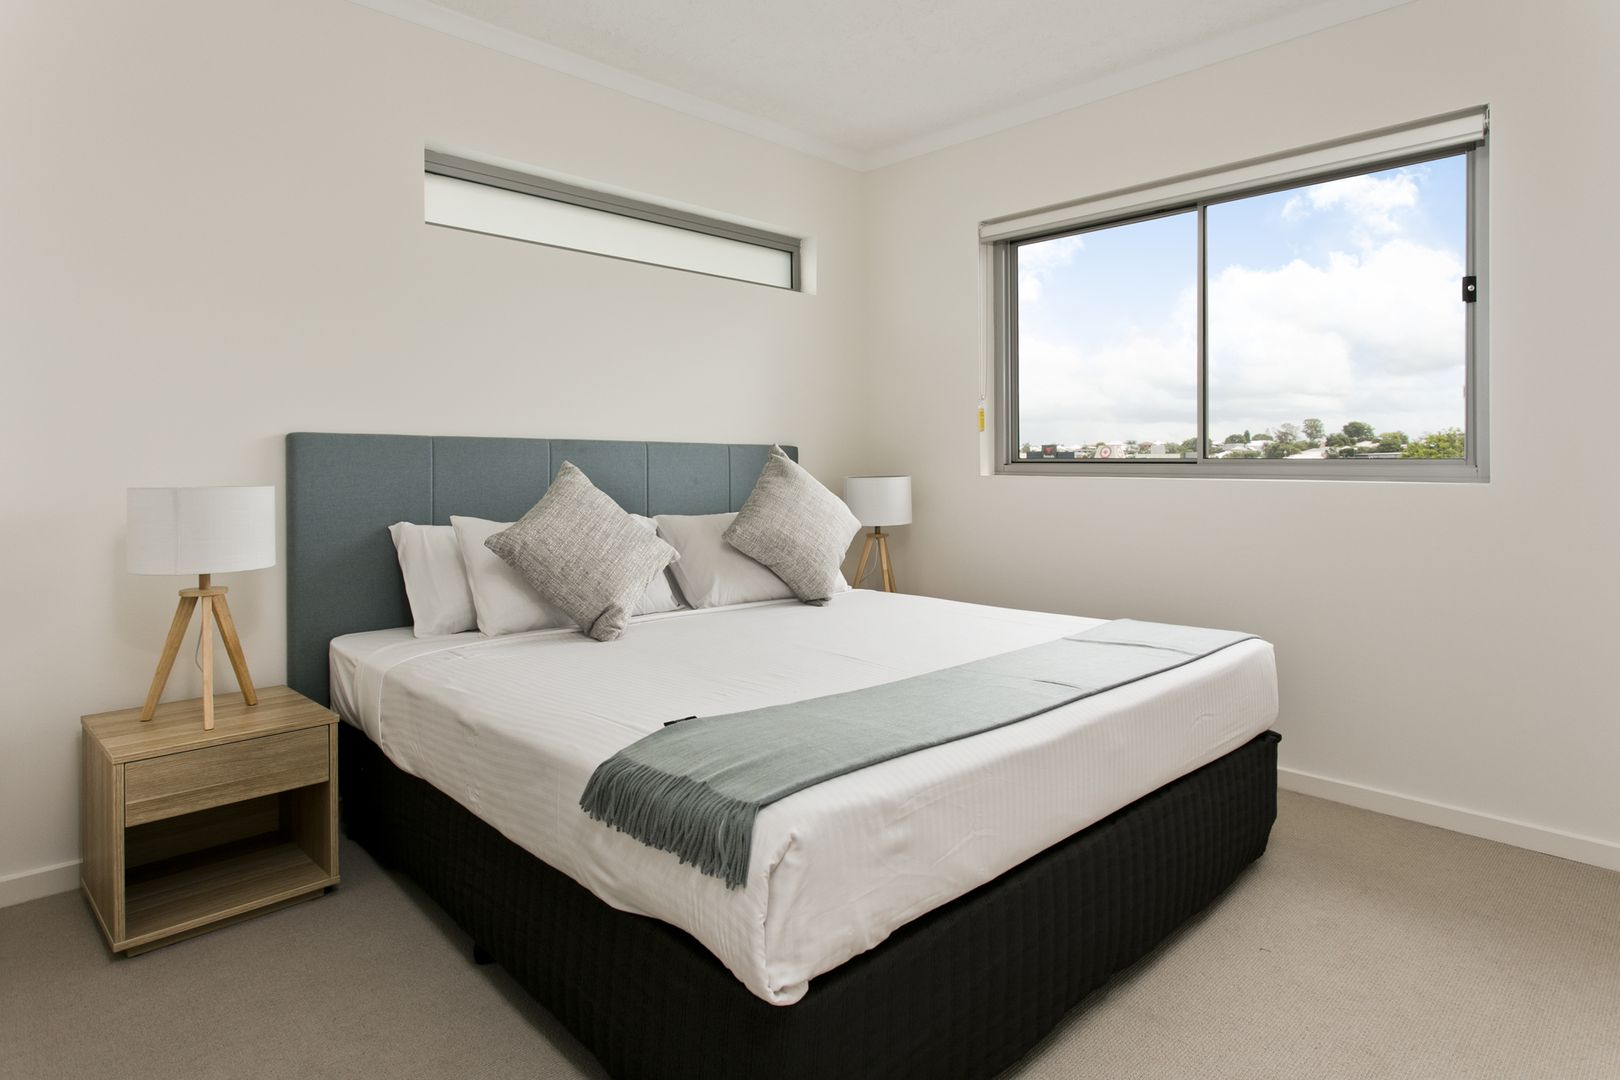 43/45 Regent St, Woolloongabba QLD 4102, Image 1